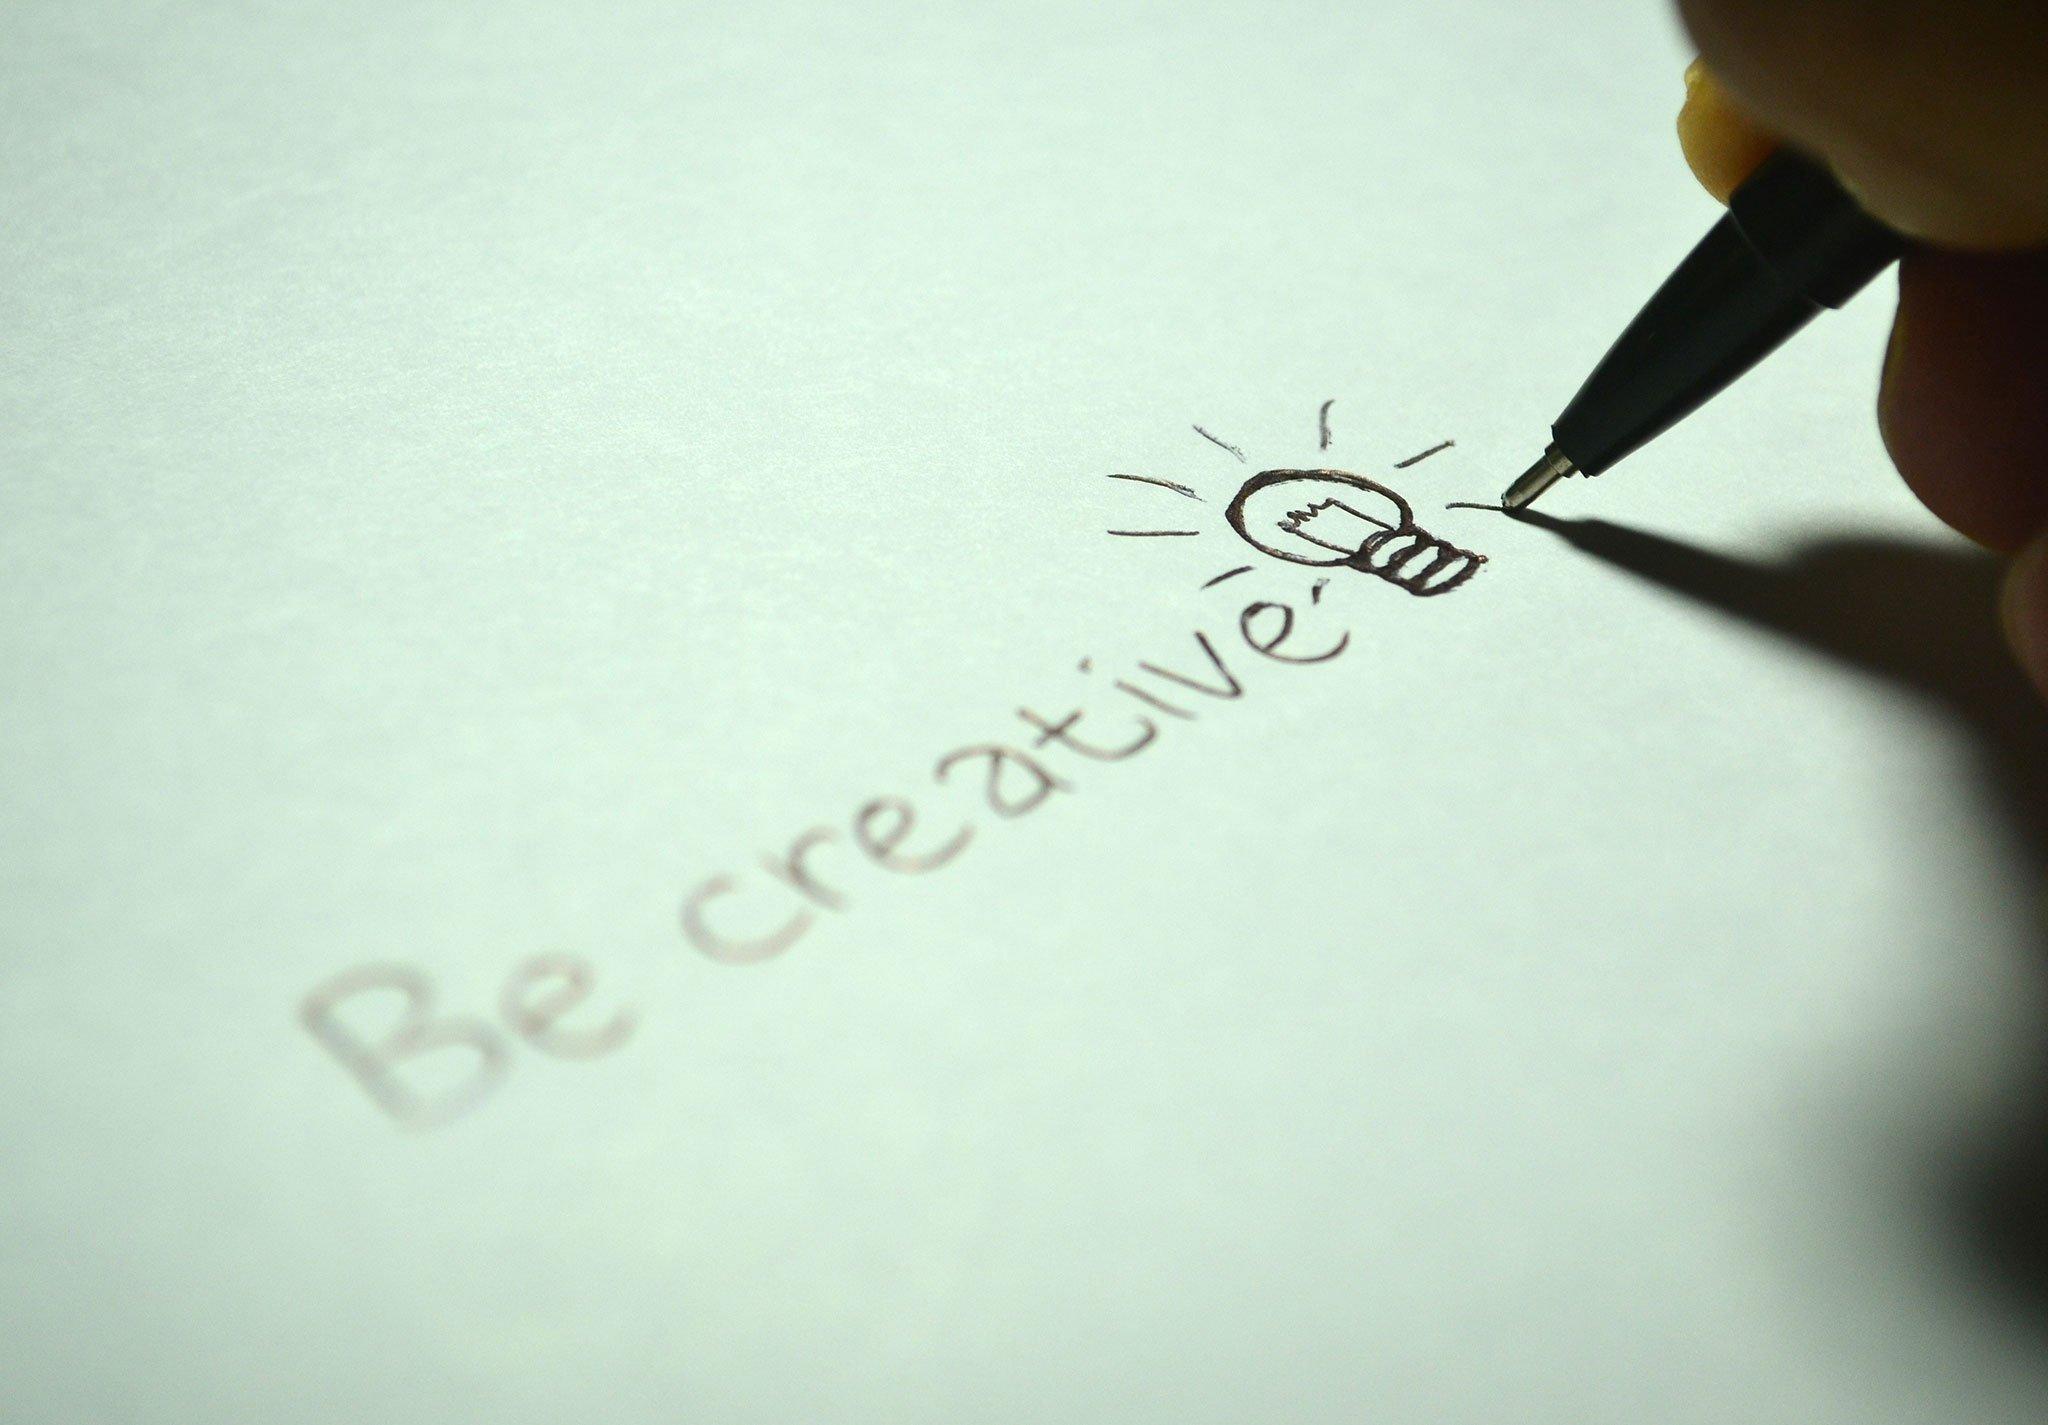 be creative illustration for entrepreneur and creativity blog post